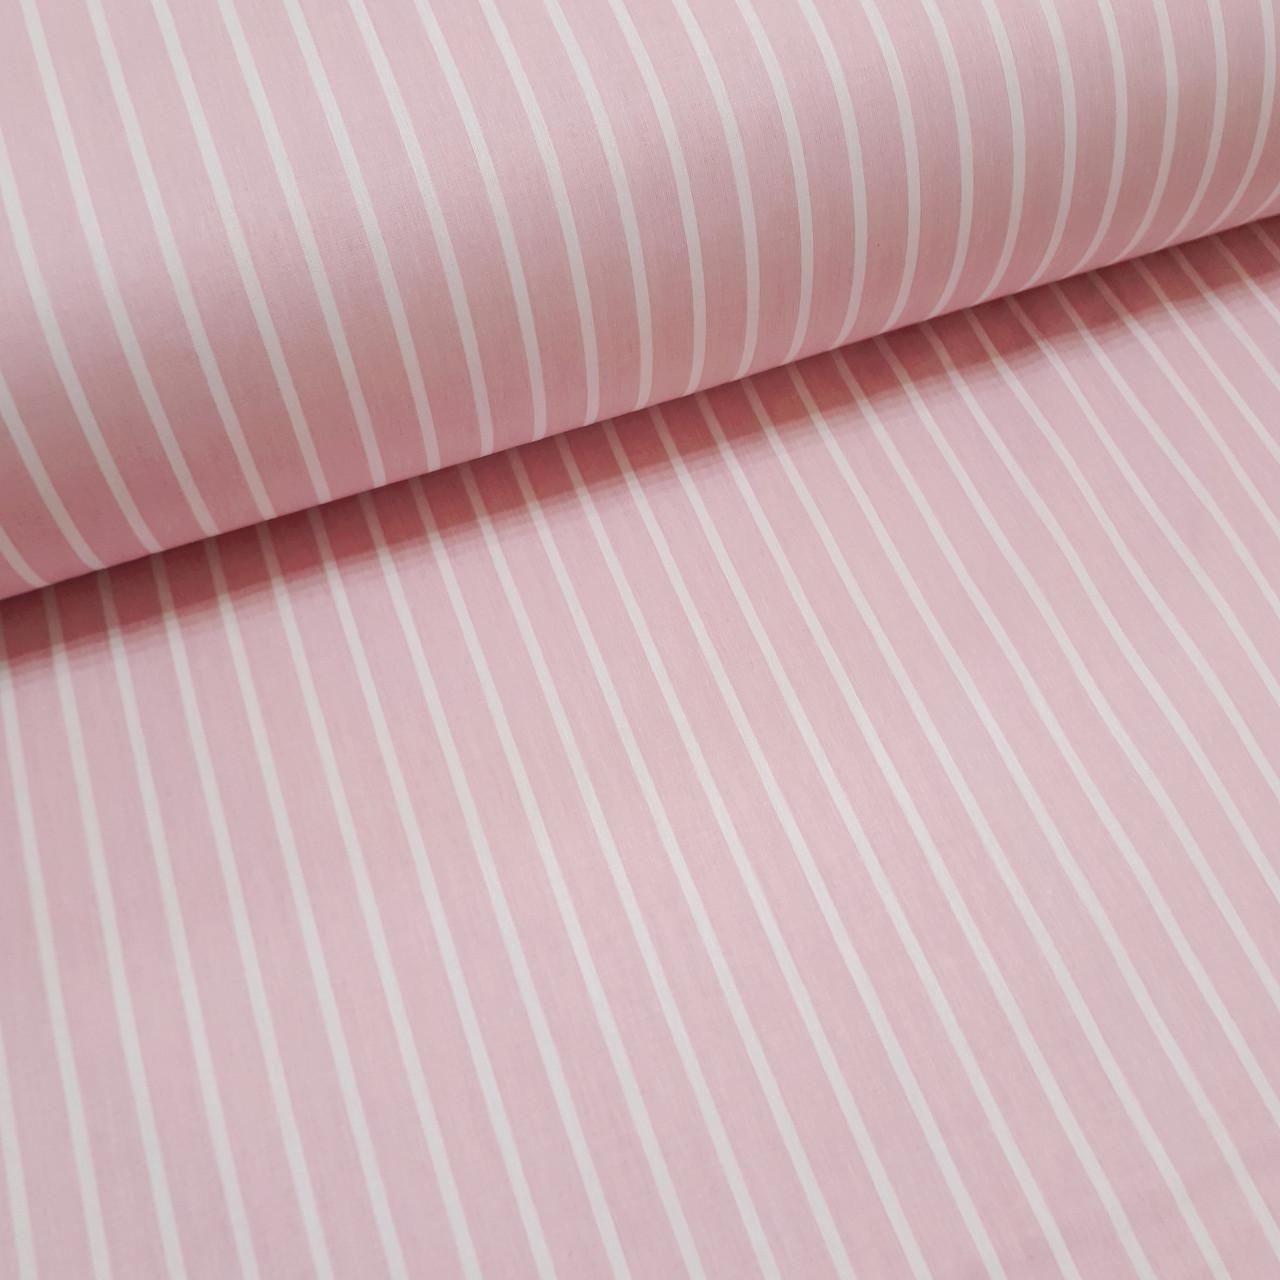 Ткань поплин белая полоска на розовом (ТУРЦИЯ шир. 2,4 м) №32-68